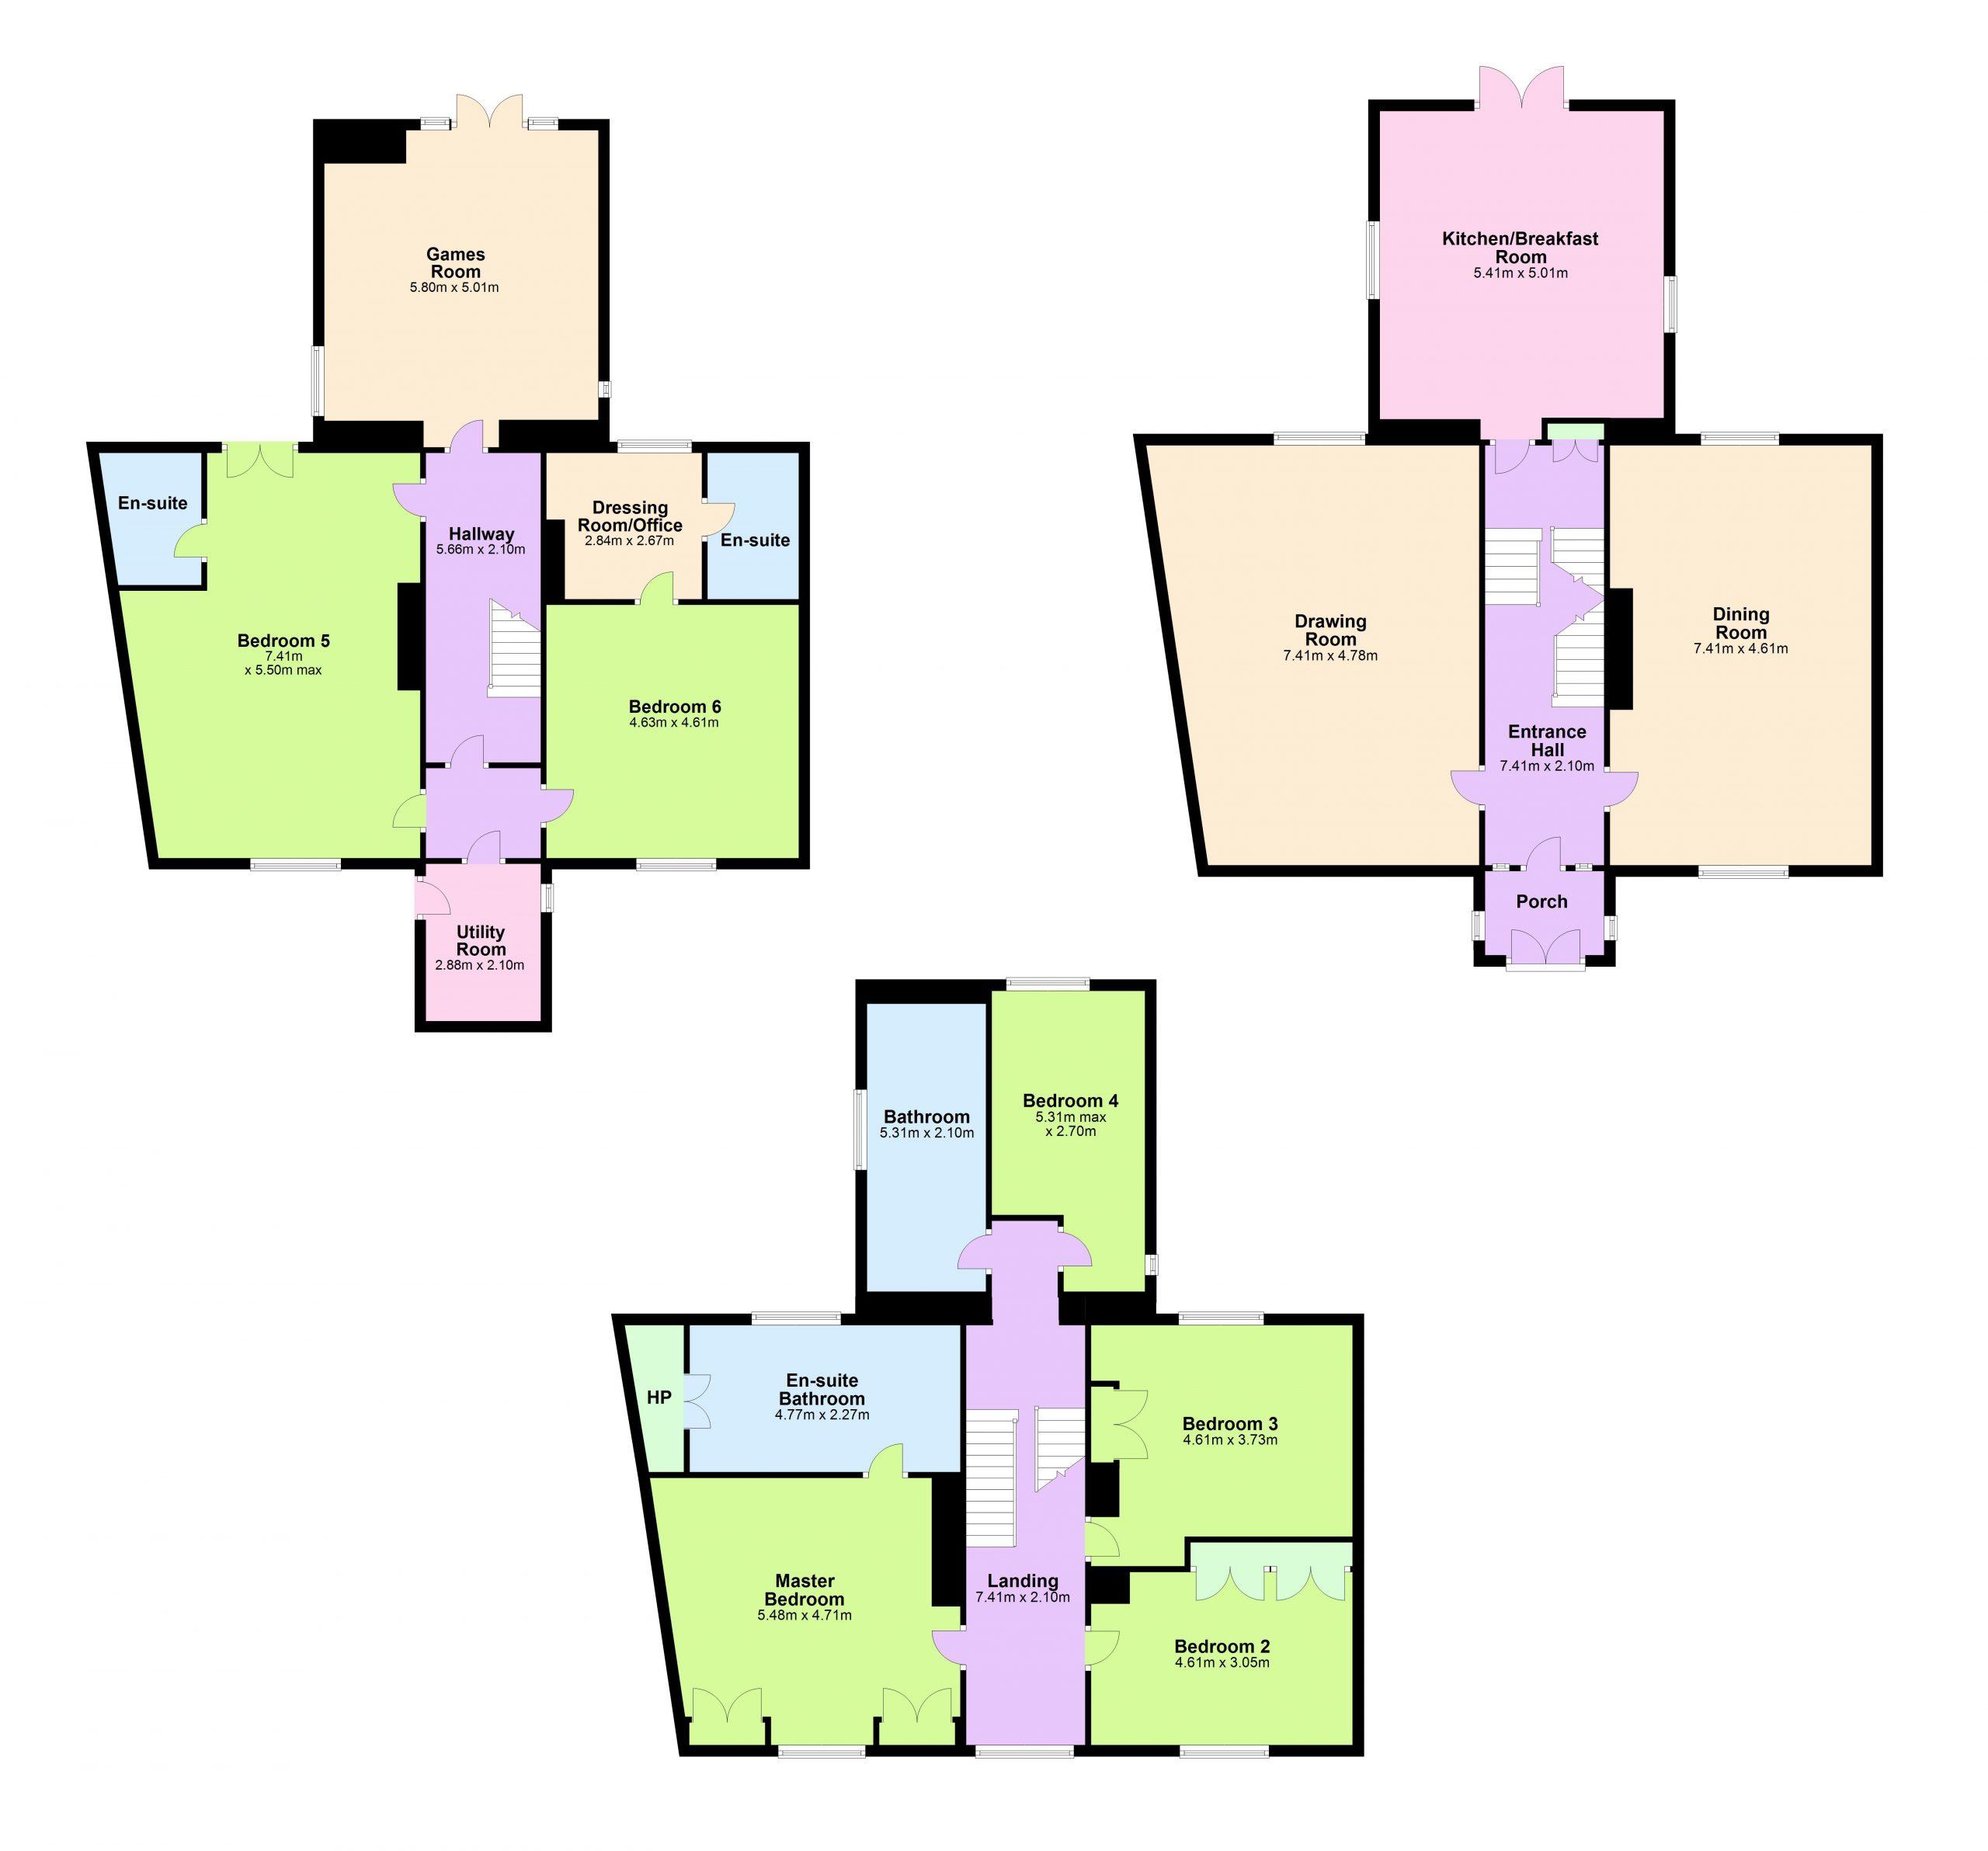 Final Floorplan